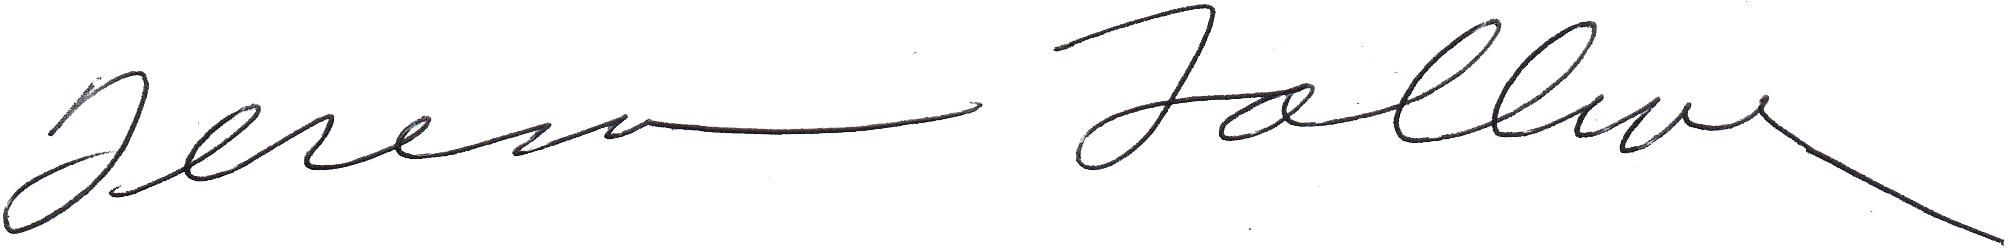 Teresa Tolliver Signature